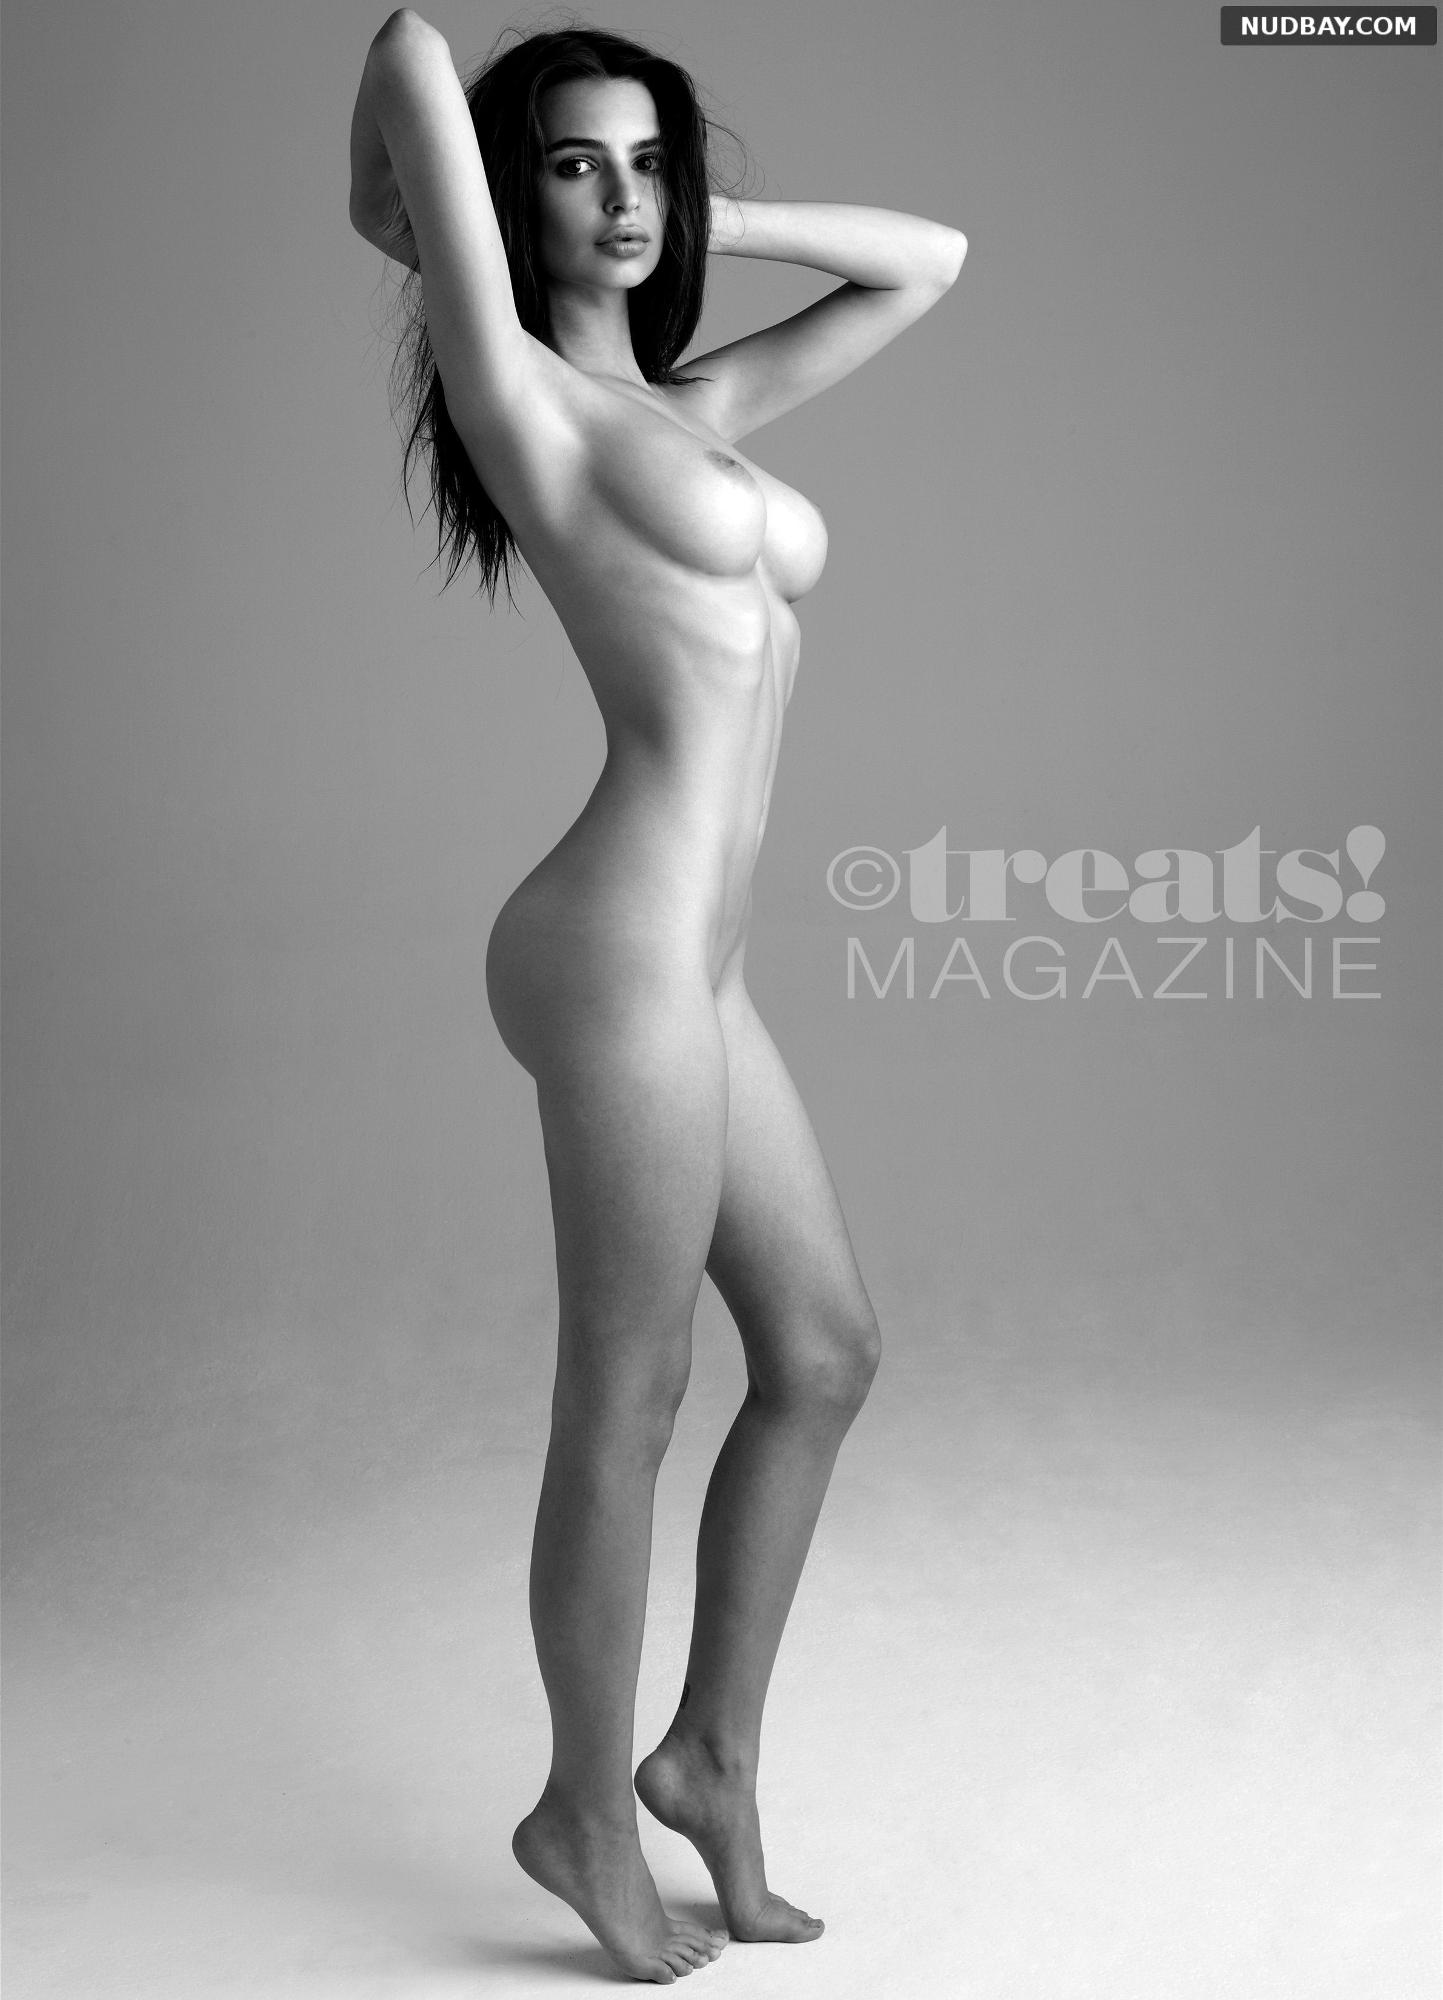 Emily Ratajkowski nude nudbay.com